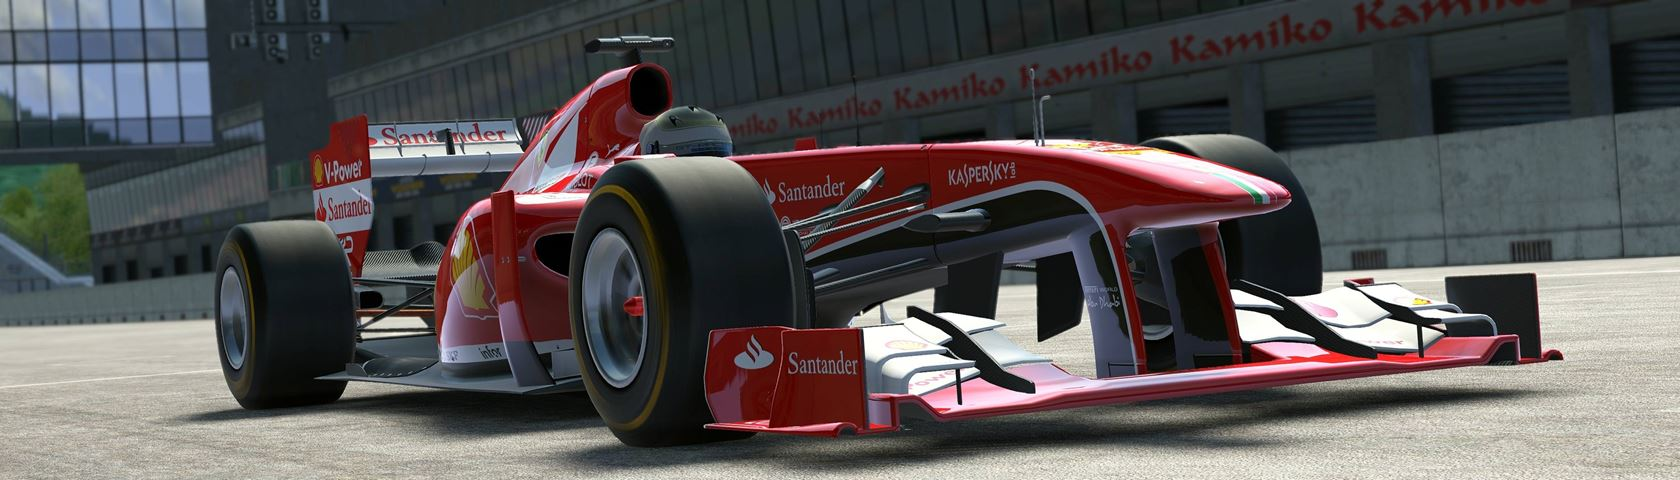 2013 Ferrari F1 Car in Project CARS